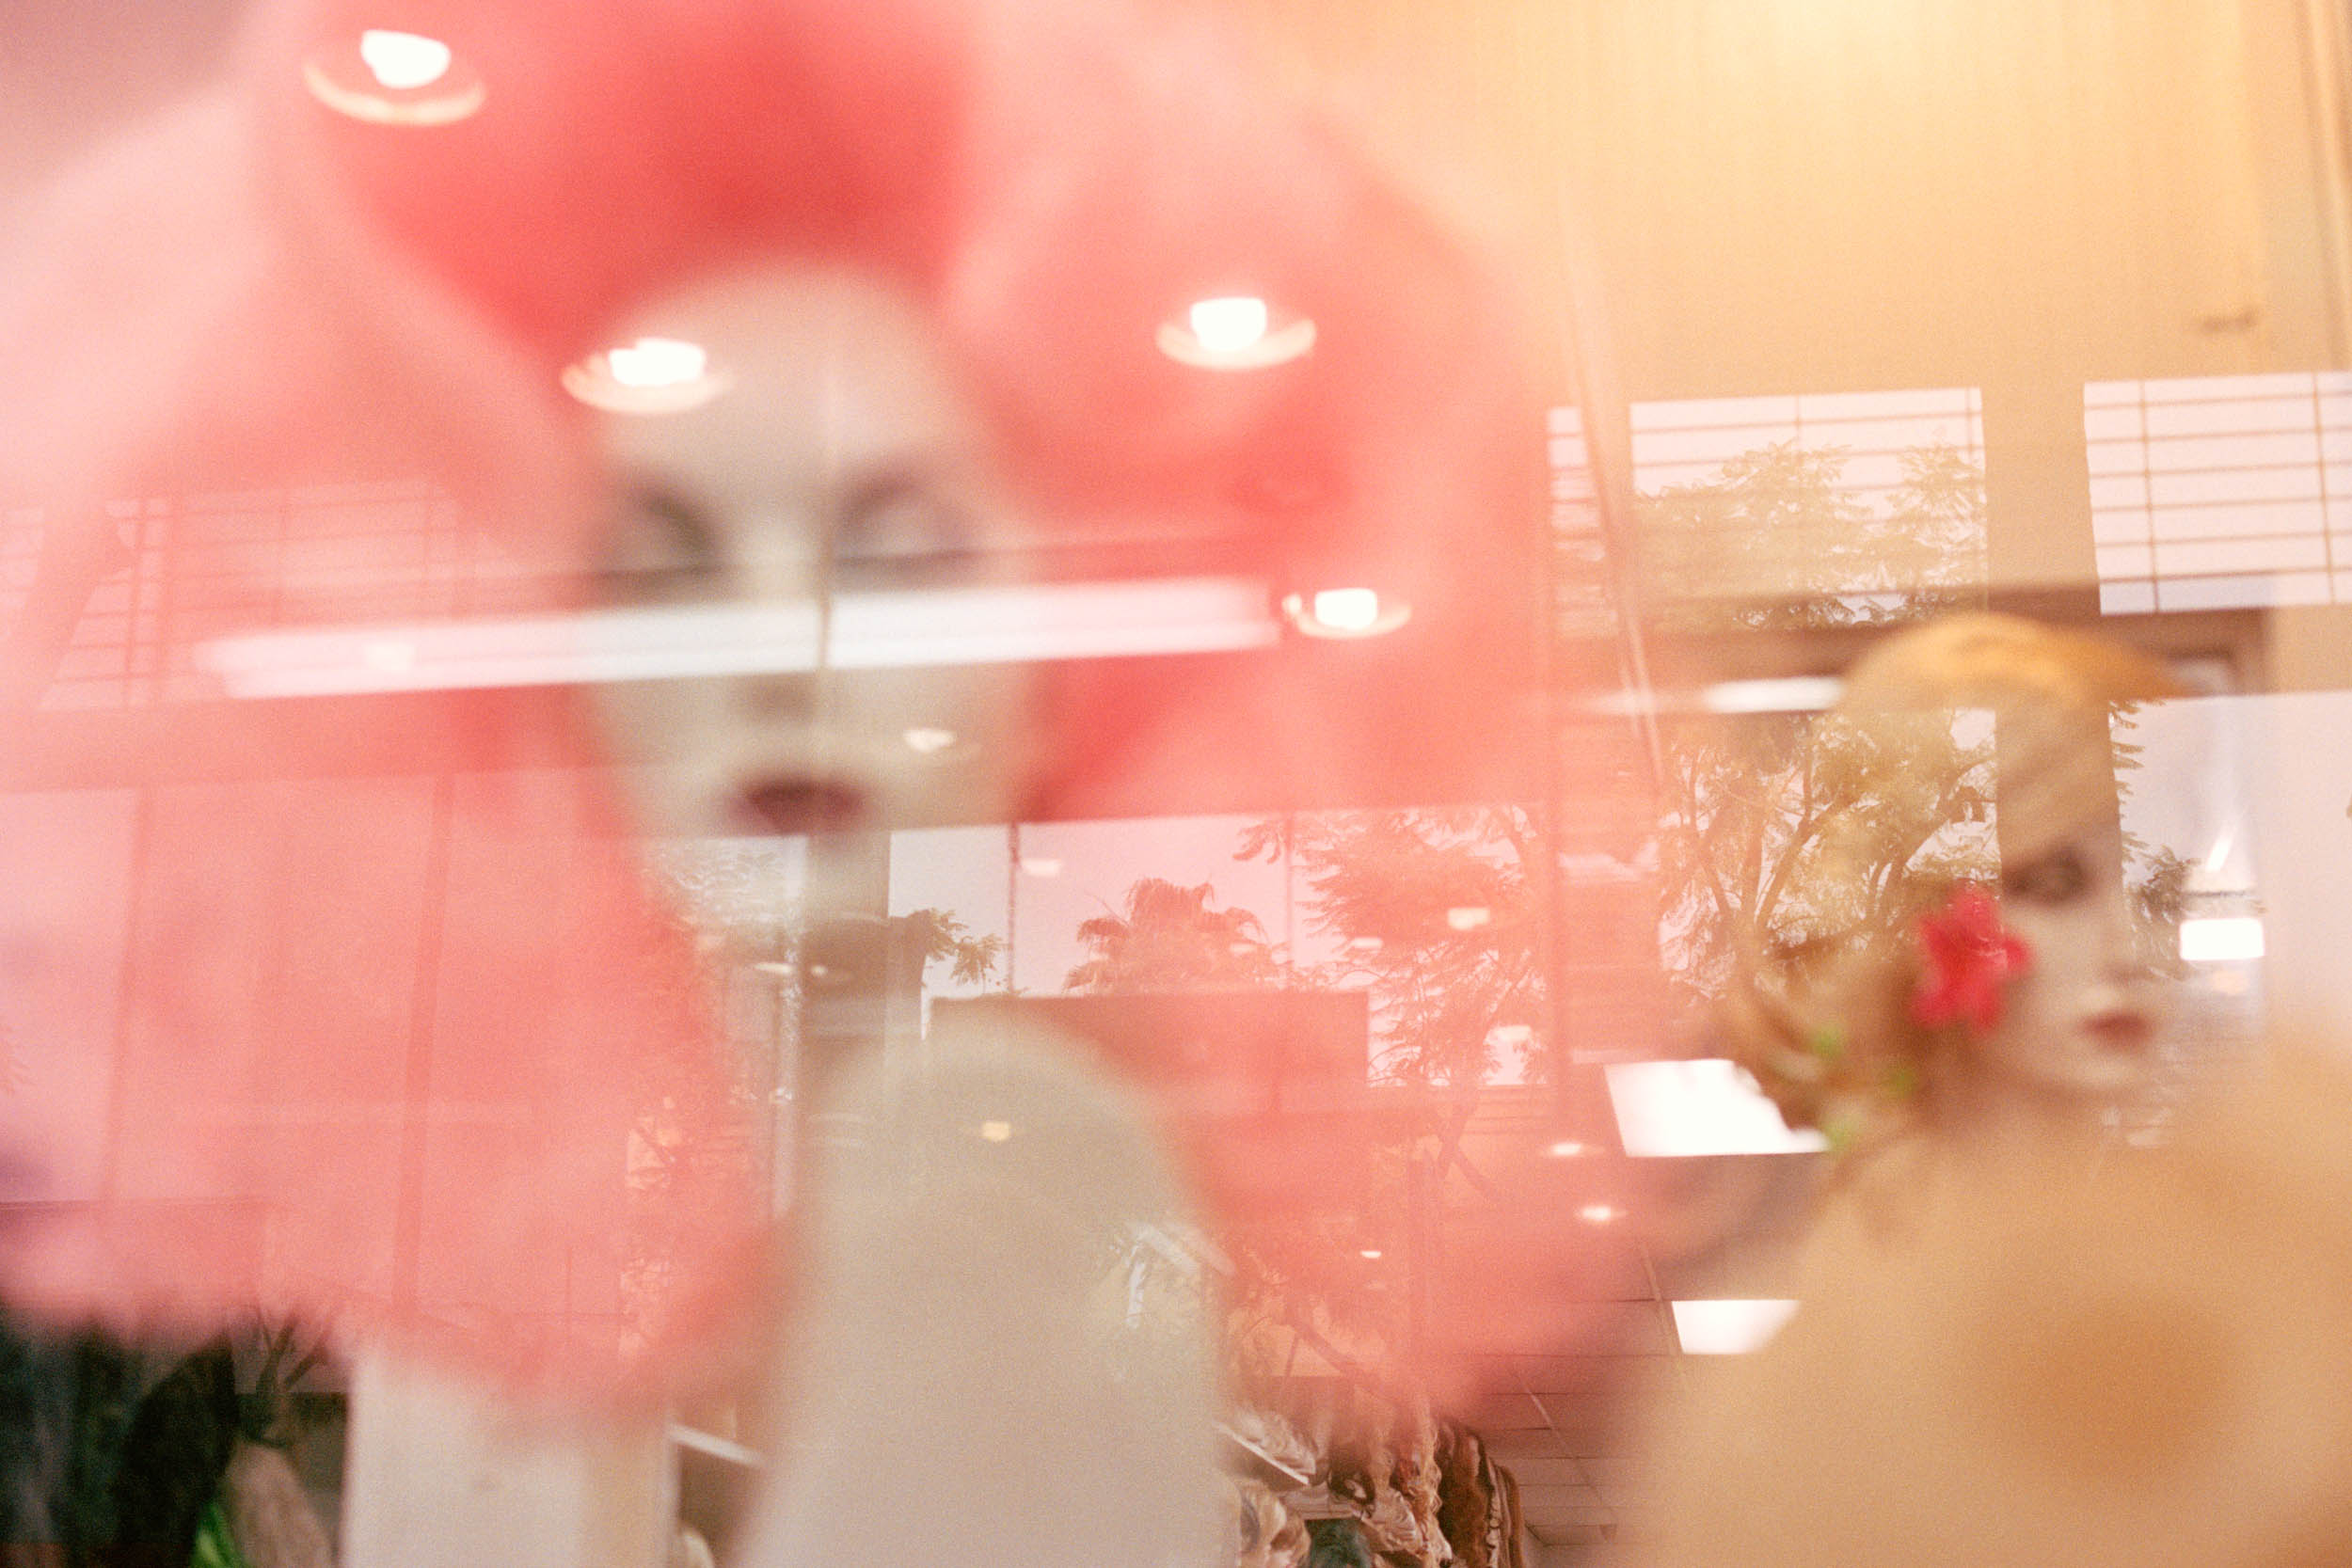 07LA 18 250028_documentary photographer, documentary scotland, freelance photographer, photographer edinburgh, photographer scotland, glasgow, mat hay, photographer london, L.A., california, los angelese, london, sunset strip, sunset boulevard.jpg